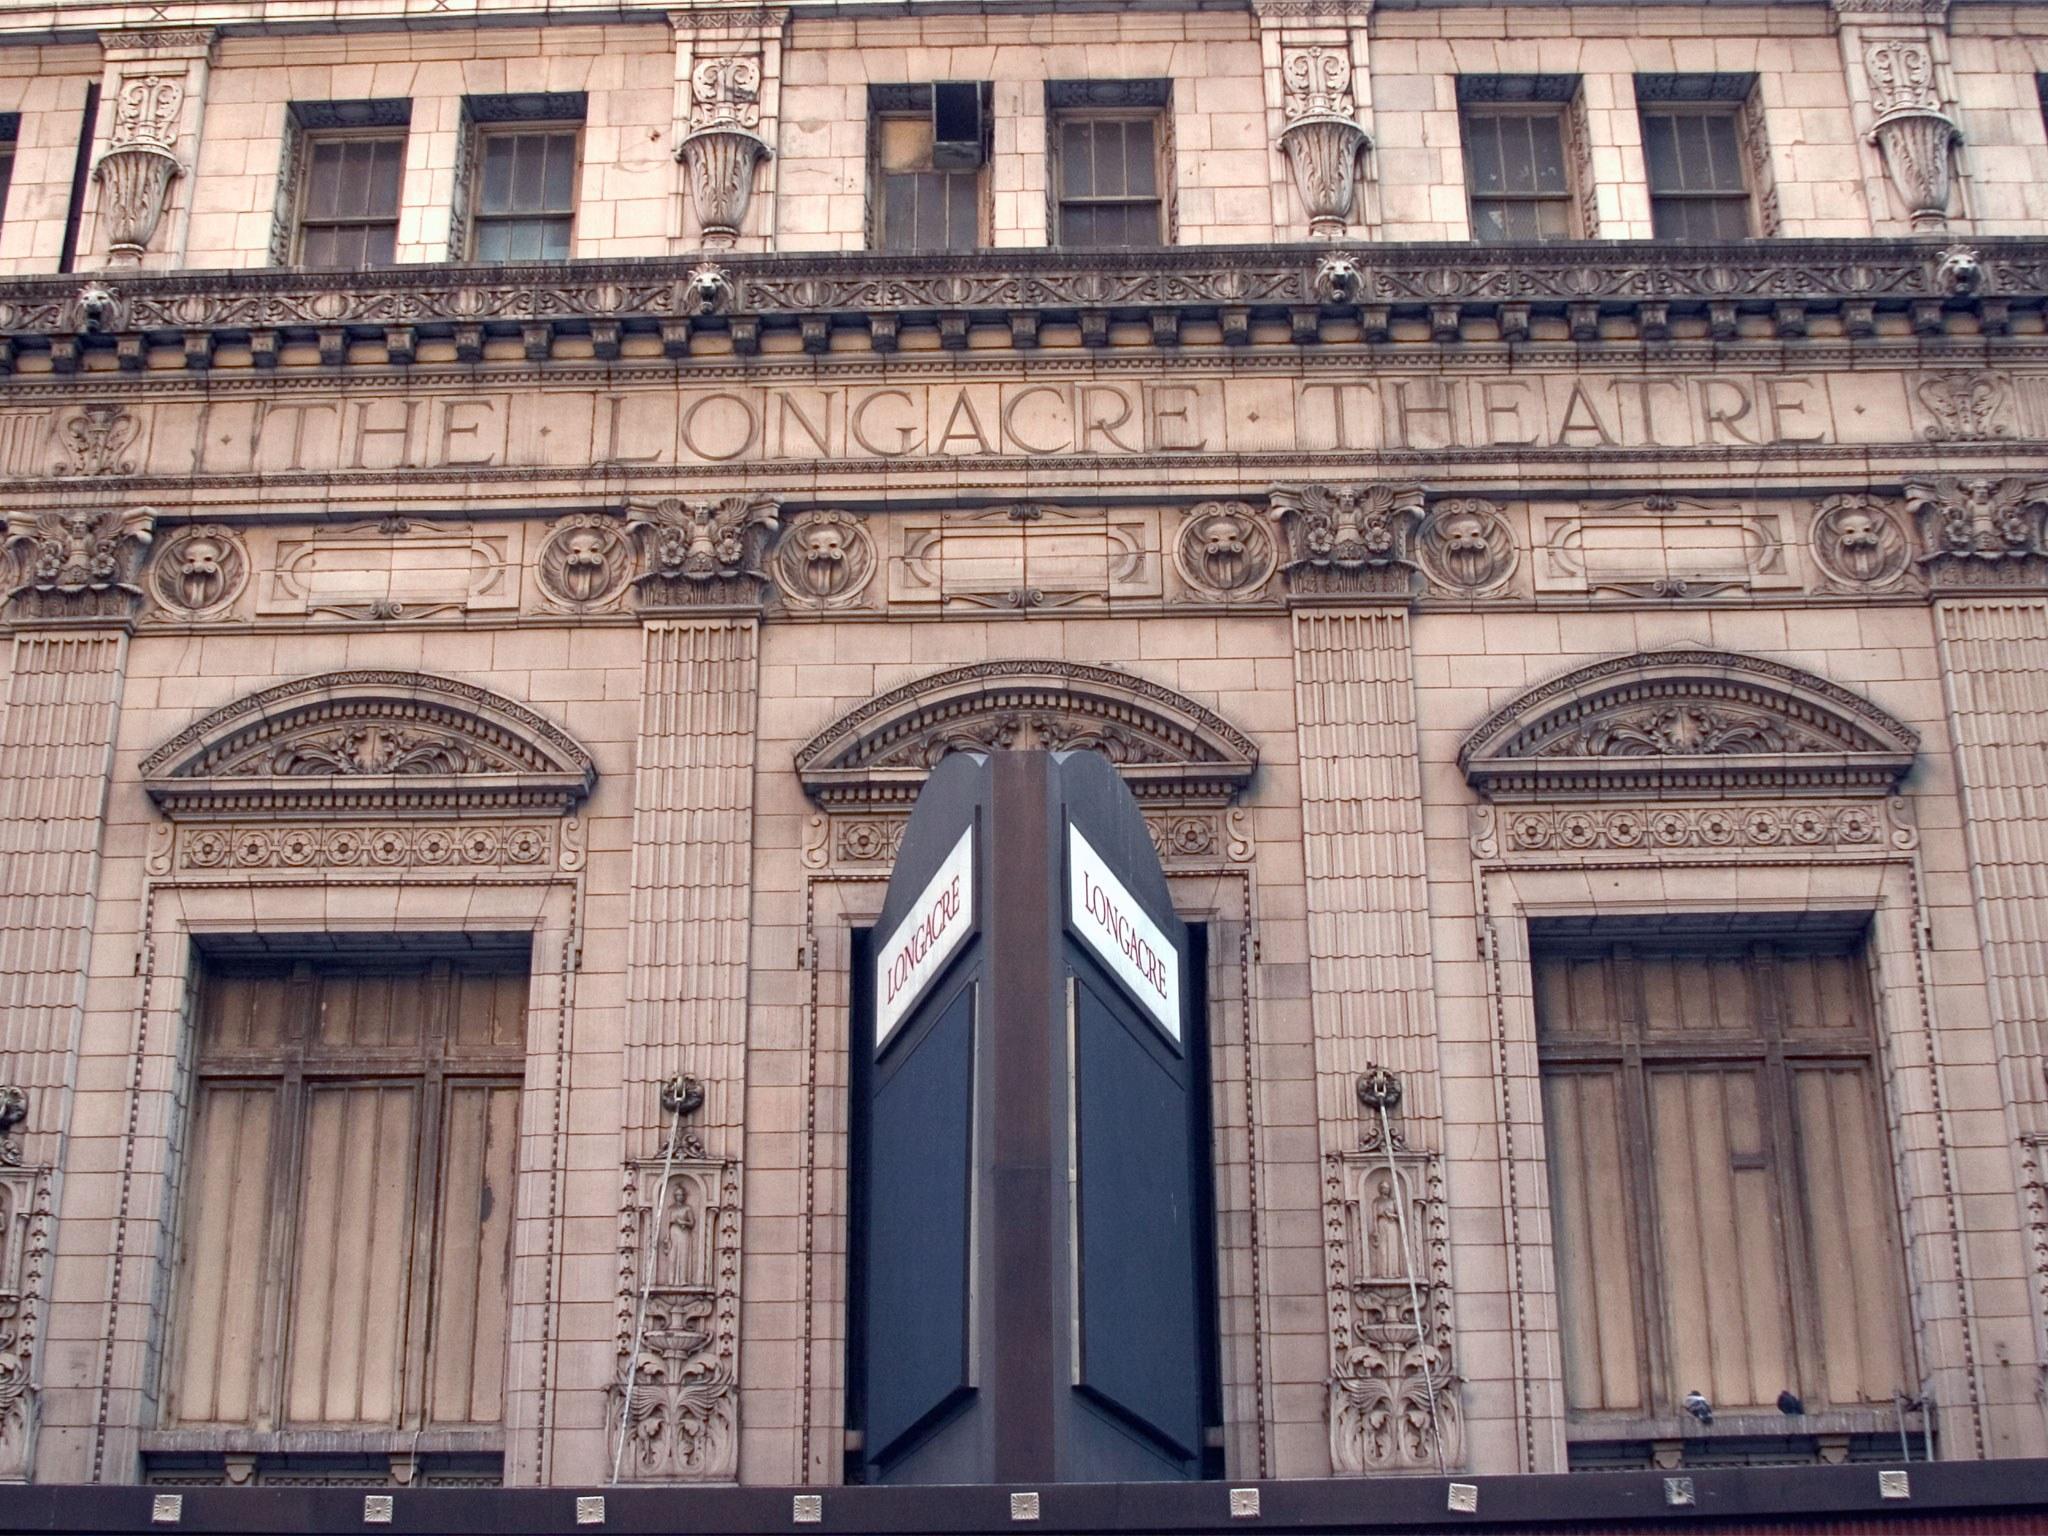 Broadway Longacre Theatre